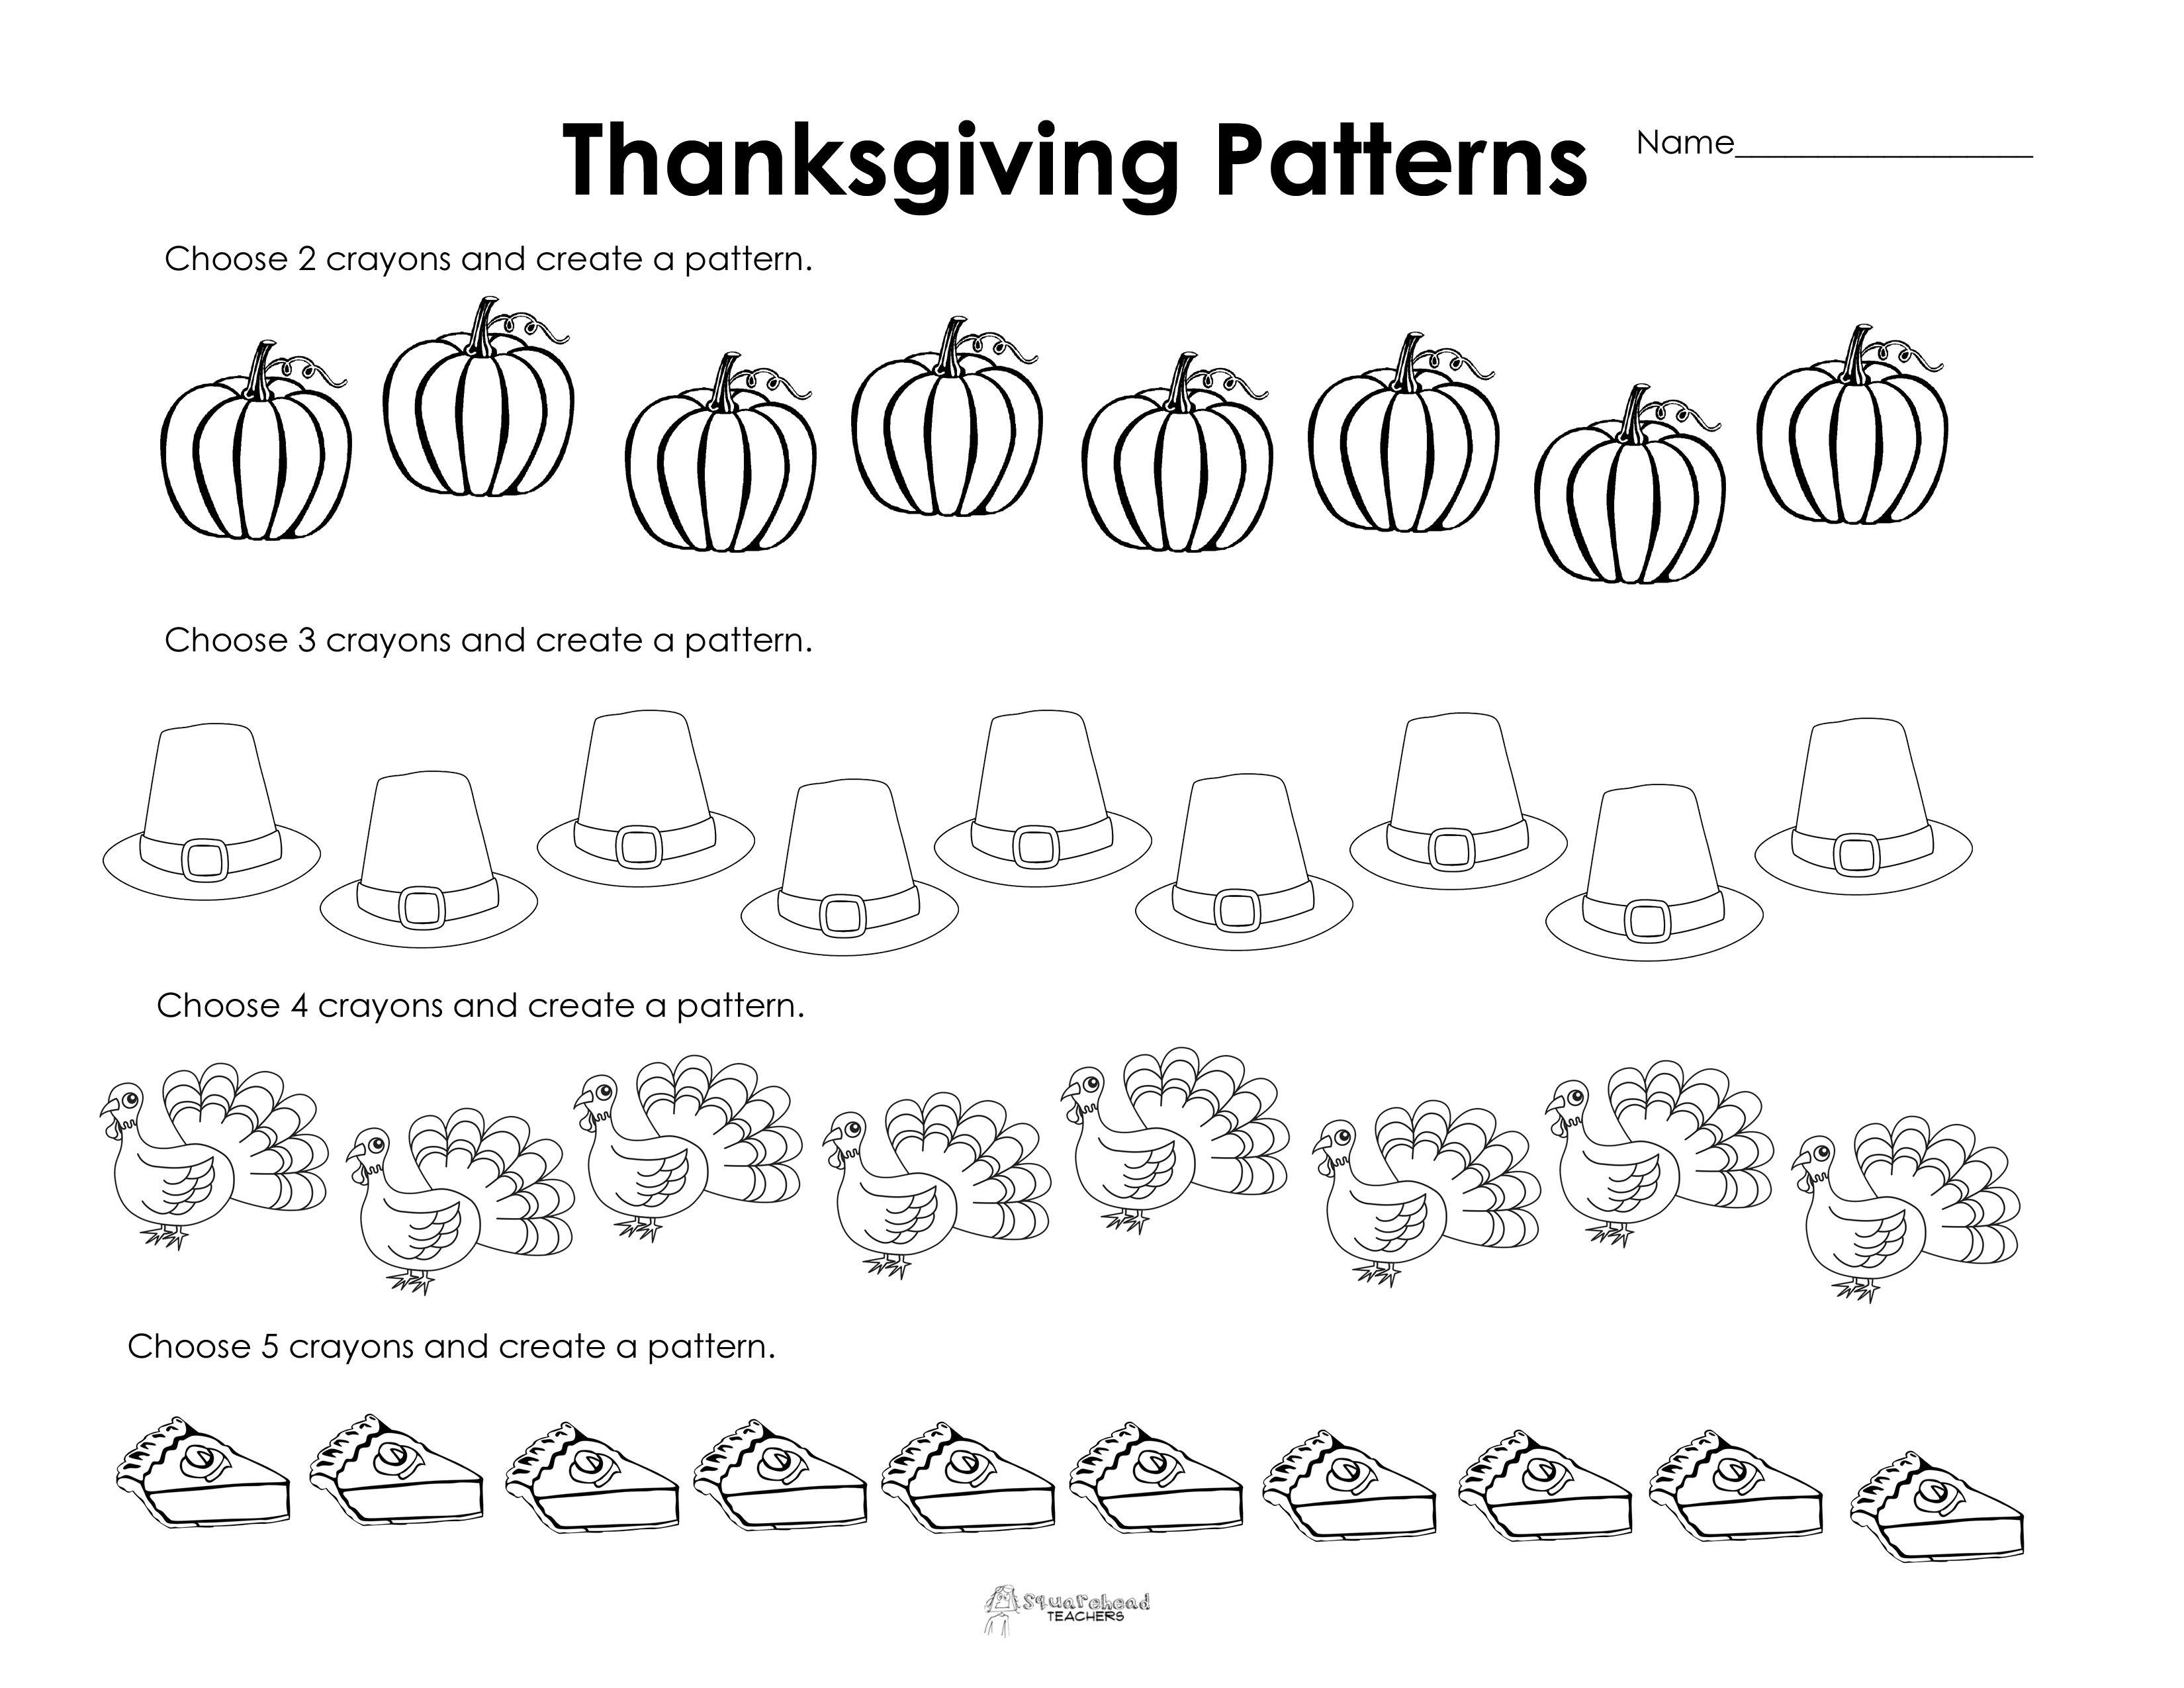 medium resolution of Making Patterns: Thanksgiving Style (free worksheet!)   Thanksgiving  worksheets